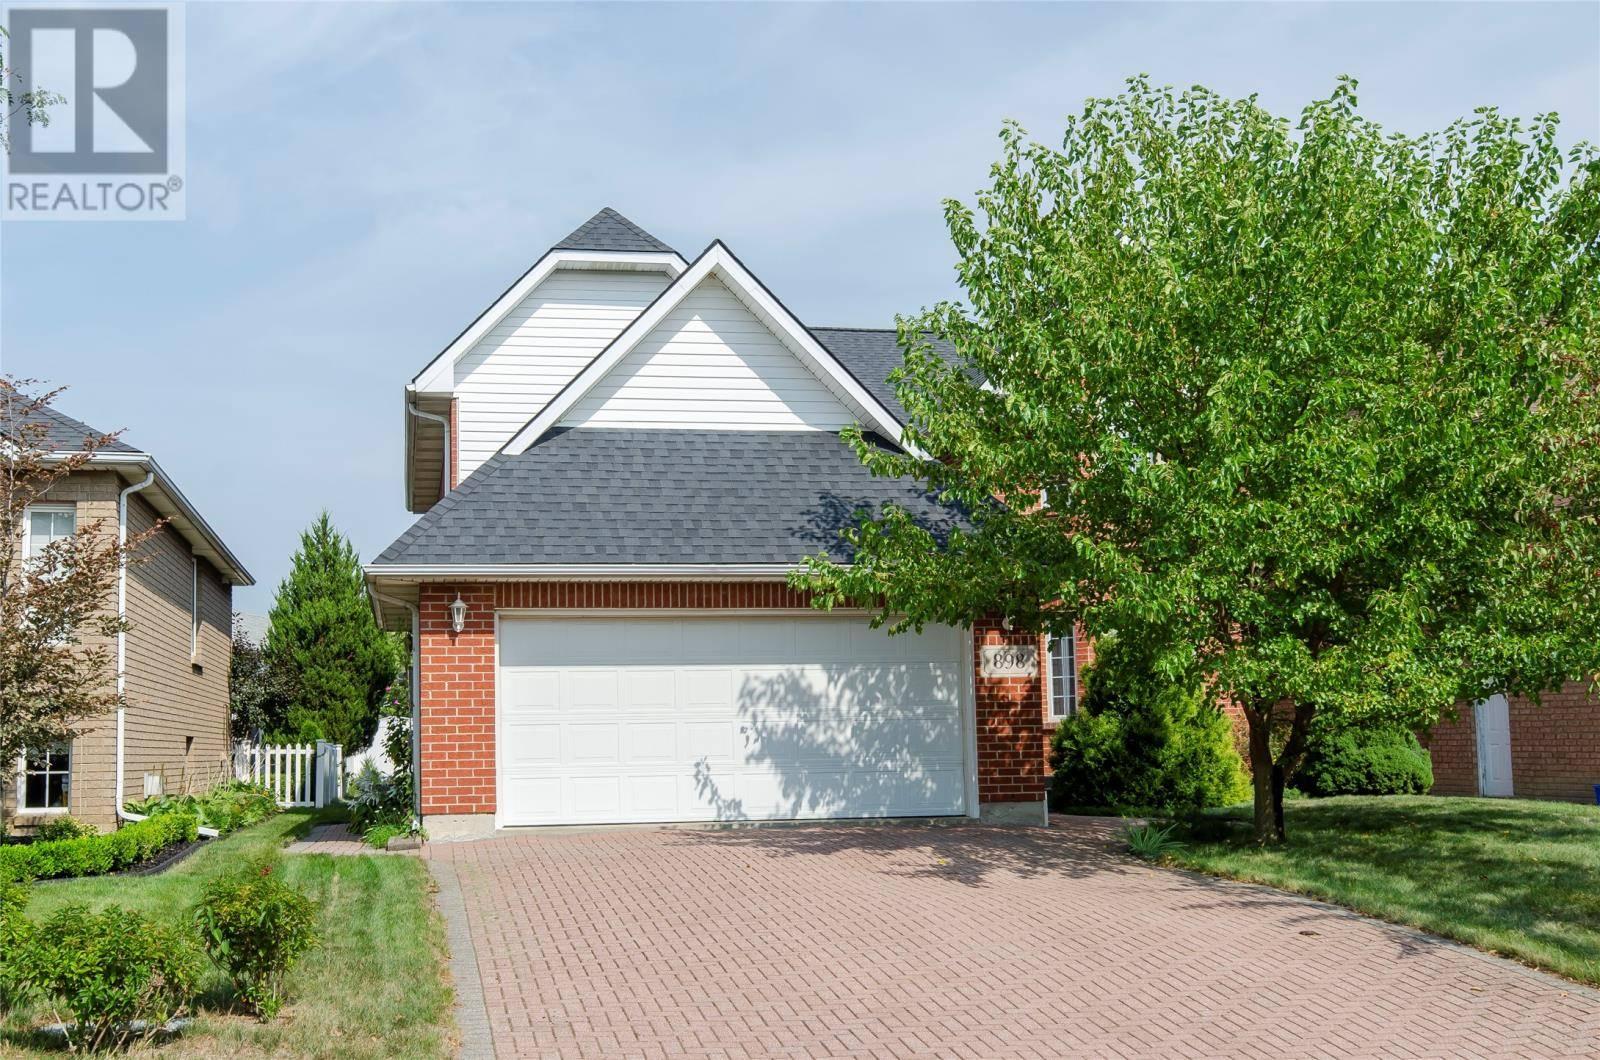 House for sale at 898 Hacienda  Windsor Ontario - MLS: 19025130